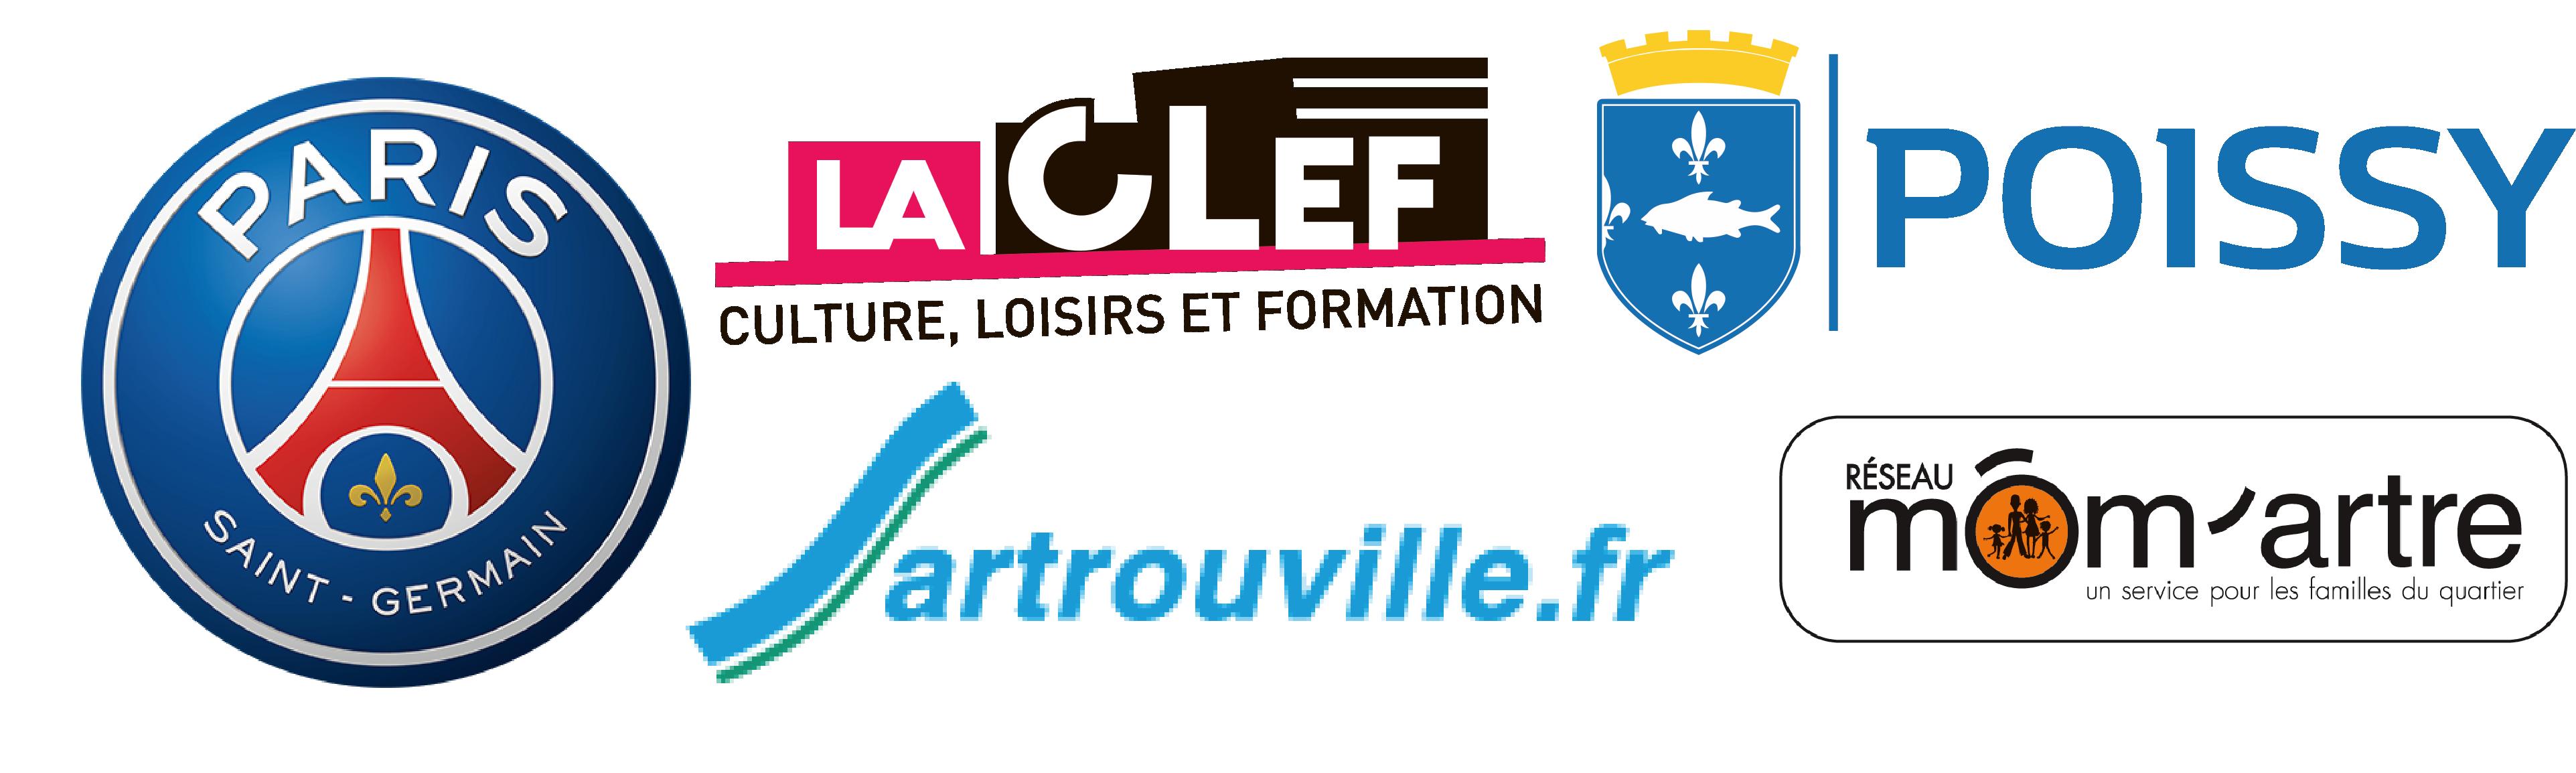 PSG - Asso - Mairies